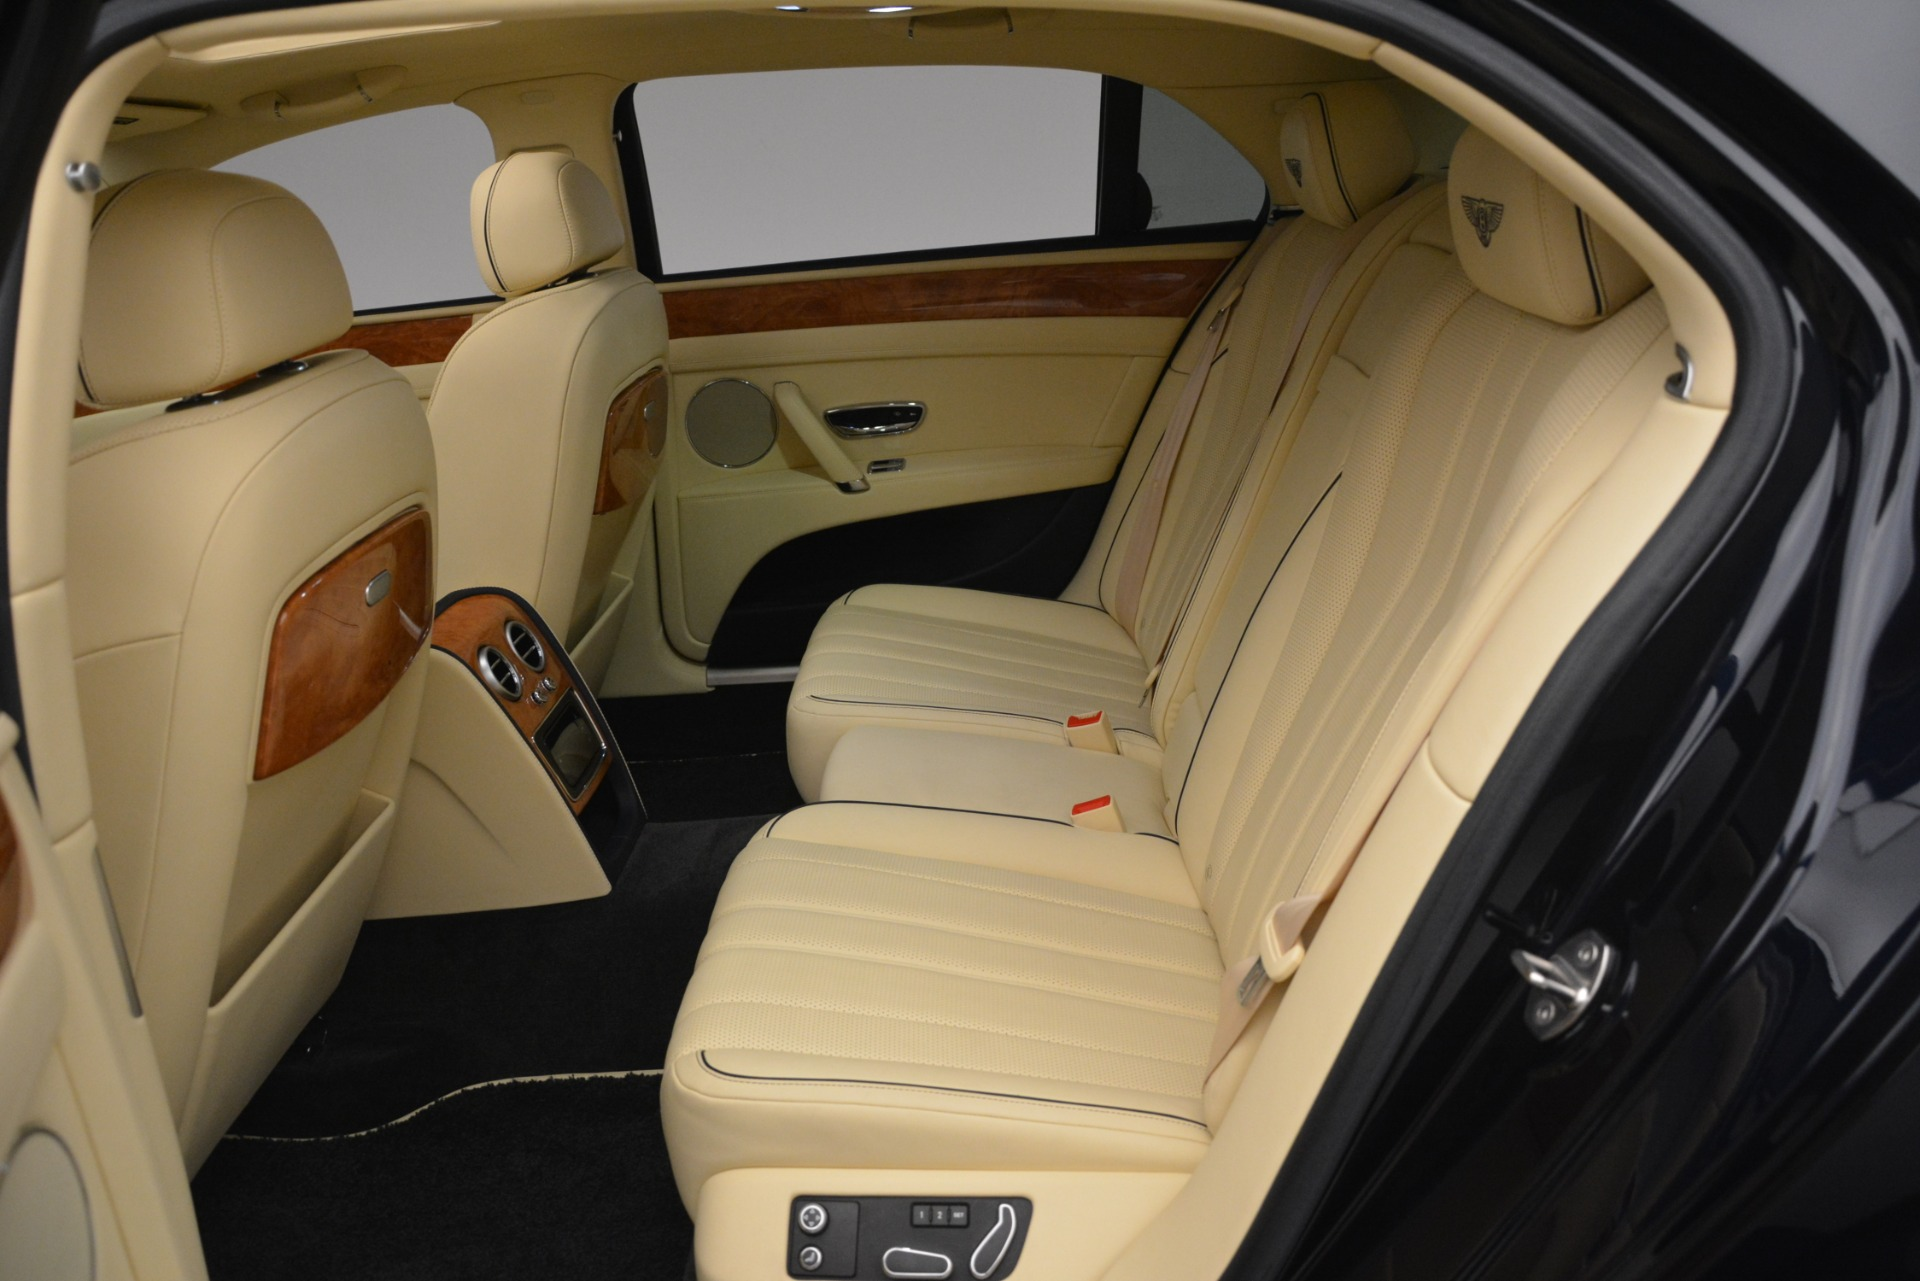 Used 2015 Bentley Flying Spur V8 For Sale In Westport, CT 2997_p24